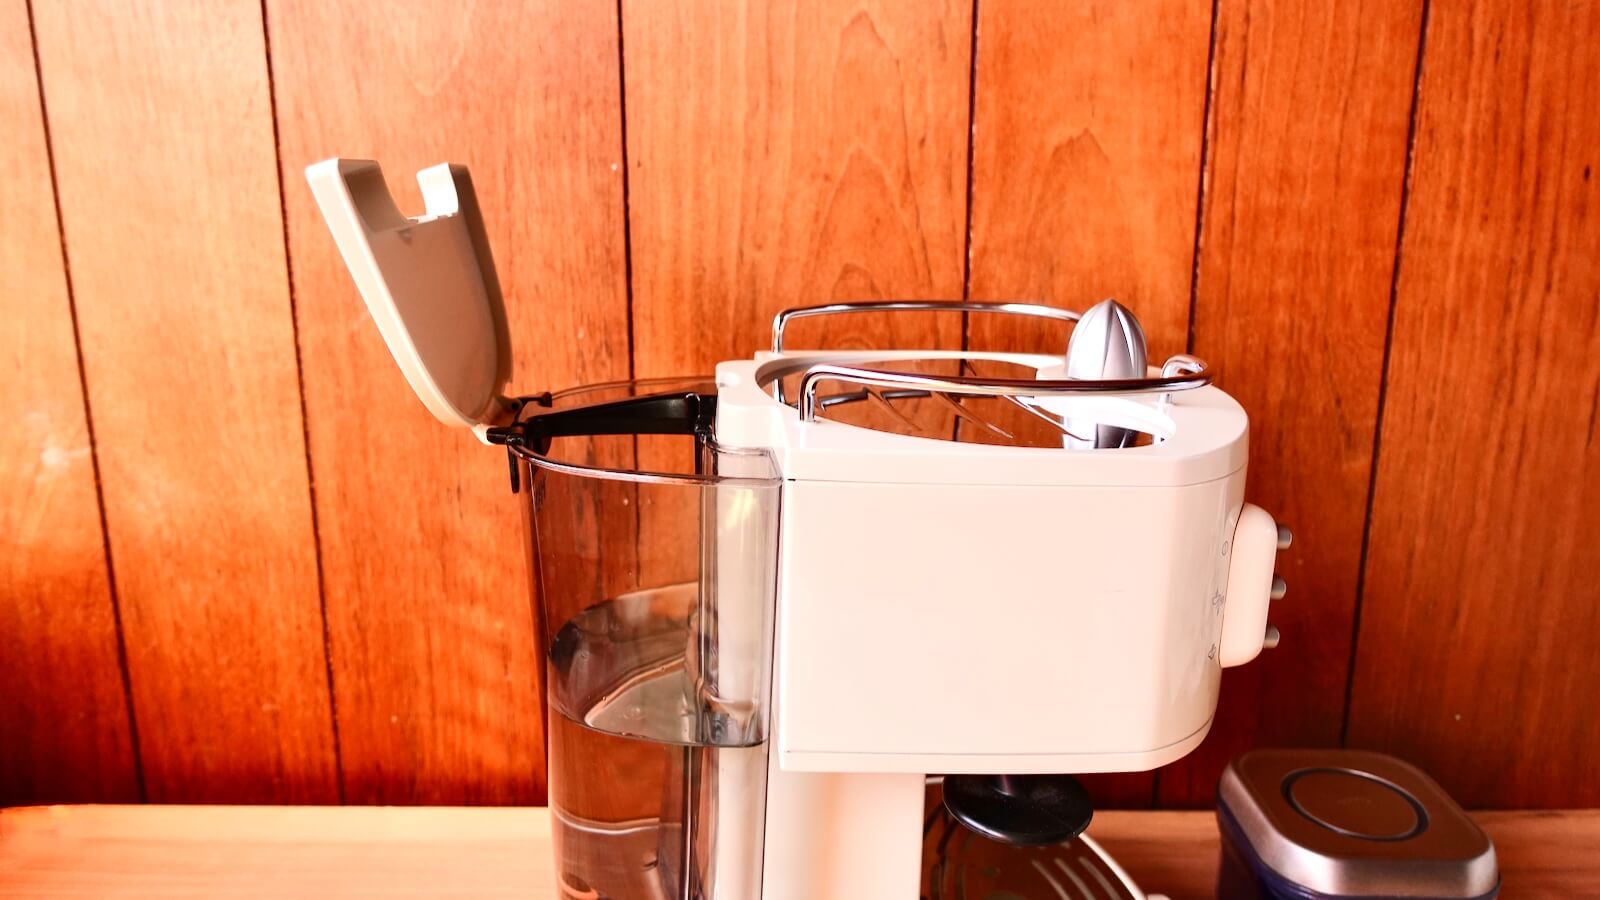 Delonghi espresso machine ECM300J Fill the water tank with water